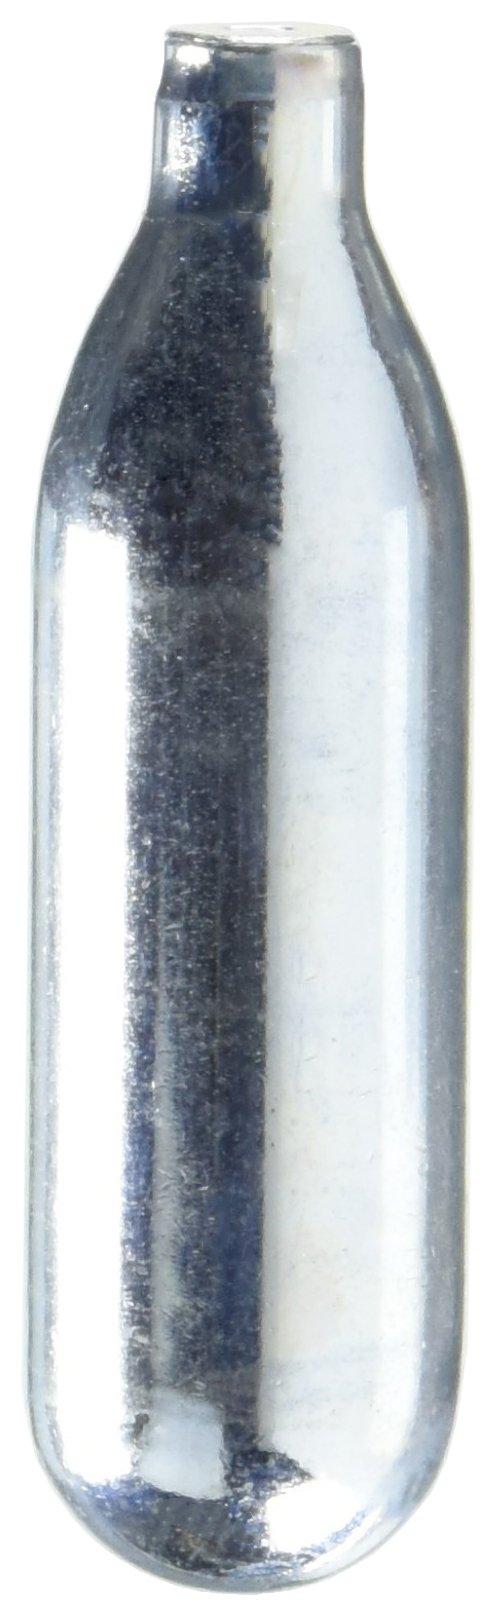 Leland Co2 Soda Chargers - 8G C02 Seltzer Water Cartridges by Leland